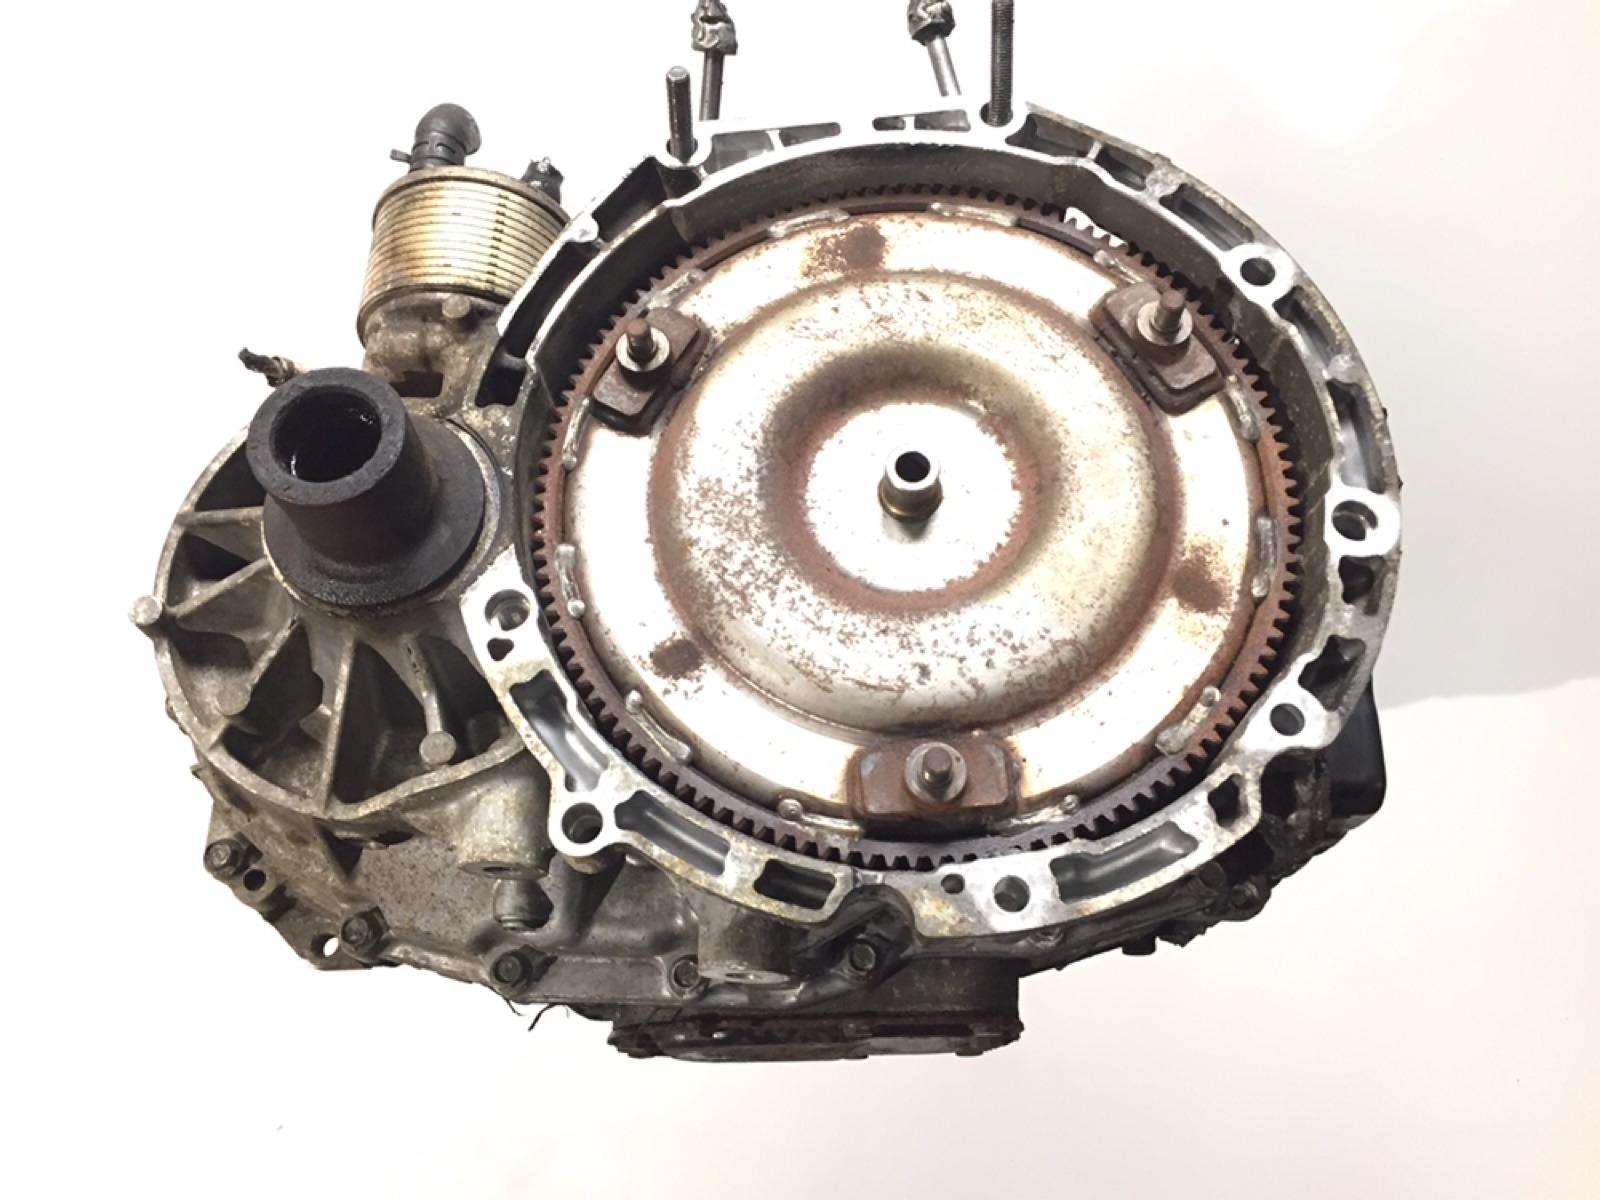 Кпп автоматическая (акпп) Seat Alhambra 1.9 TDI 2002 (б/у)